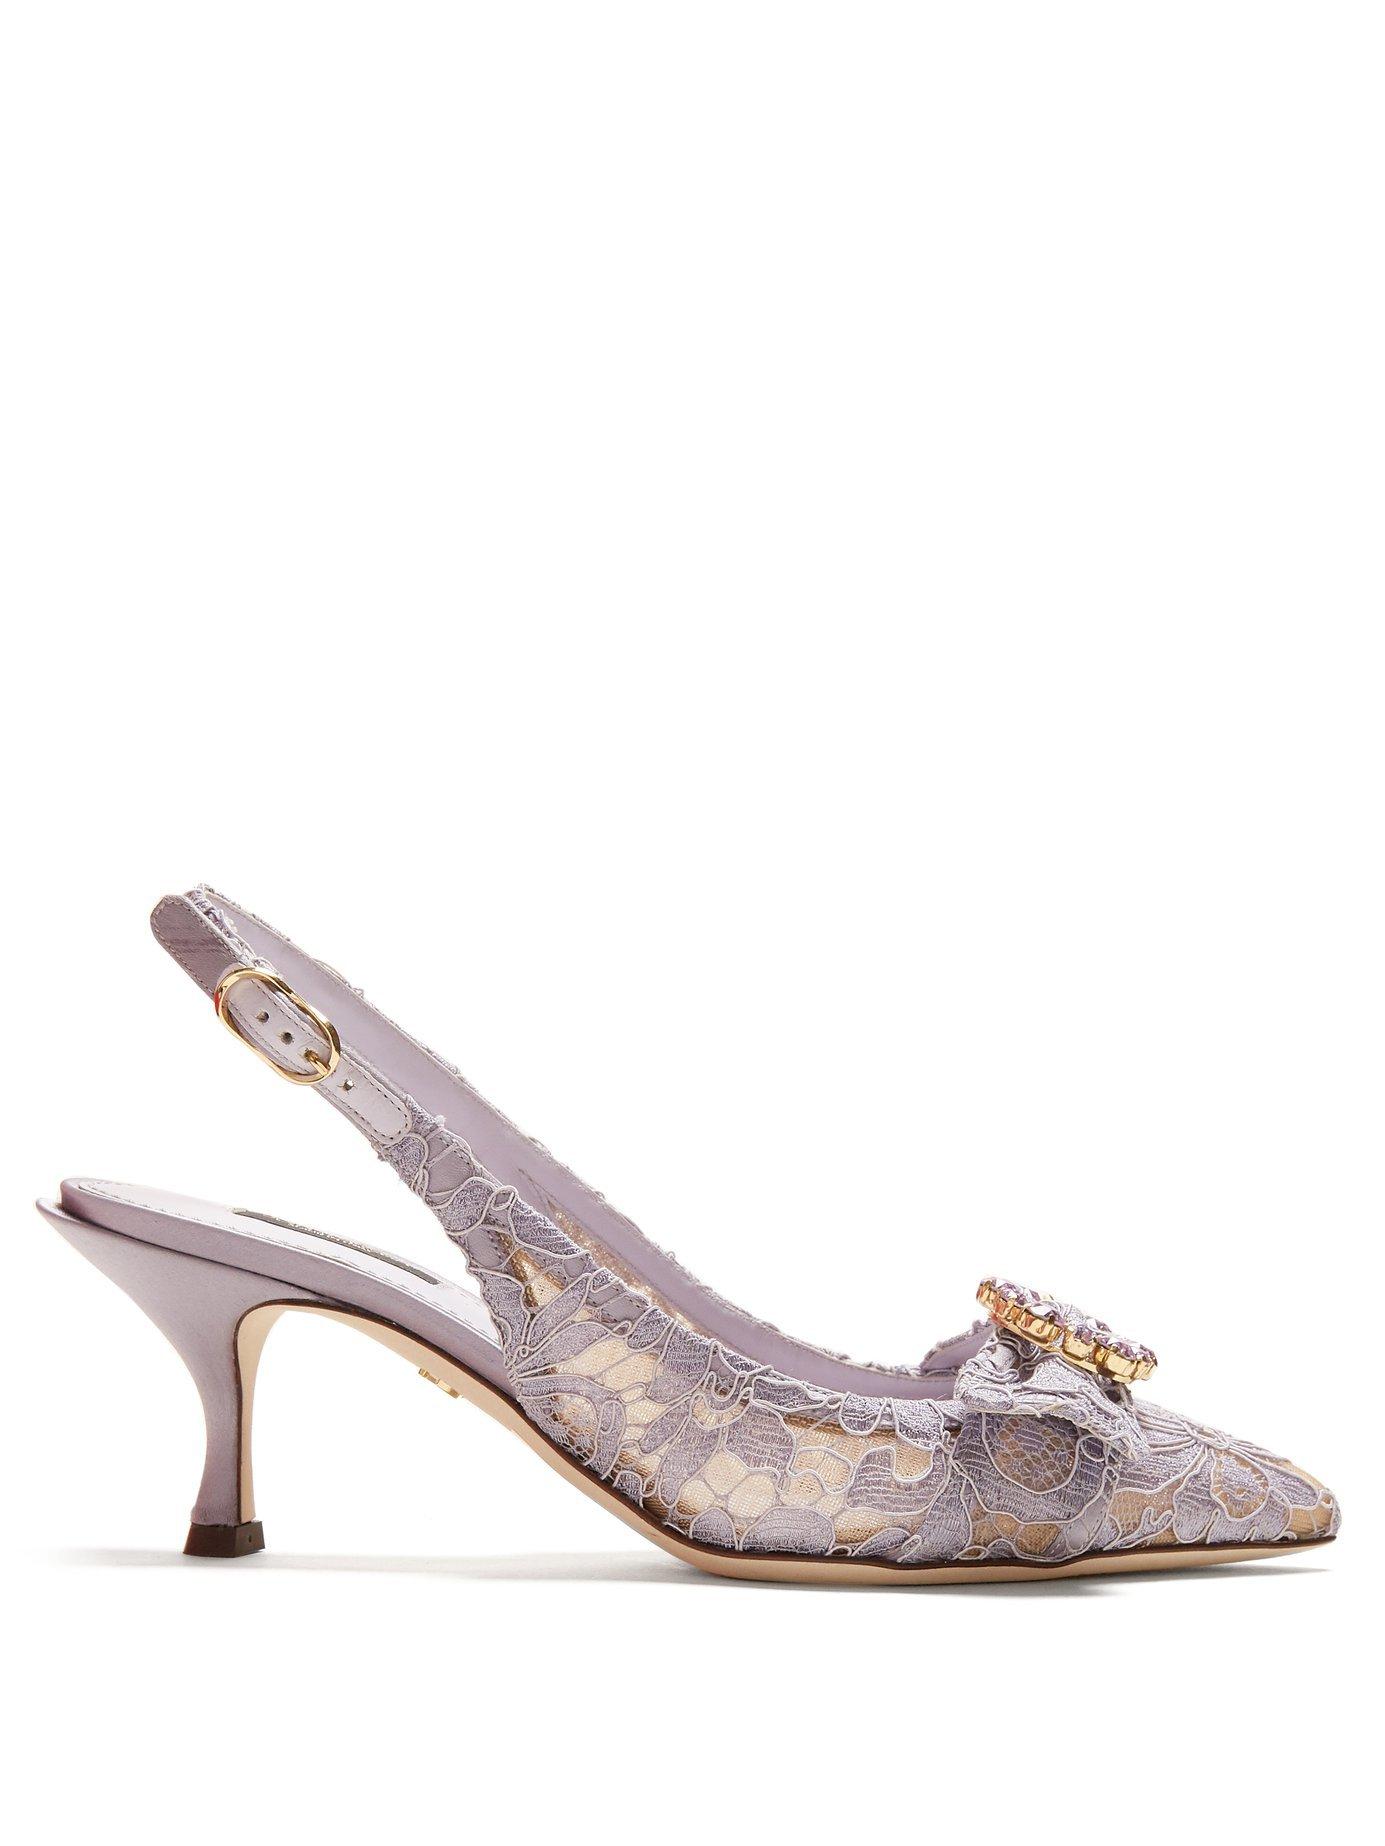 Lori crystal-embellished lace kitten-heel pumps | Dolce & Gabbana | MATCHESFASHION.COM US